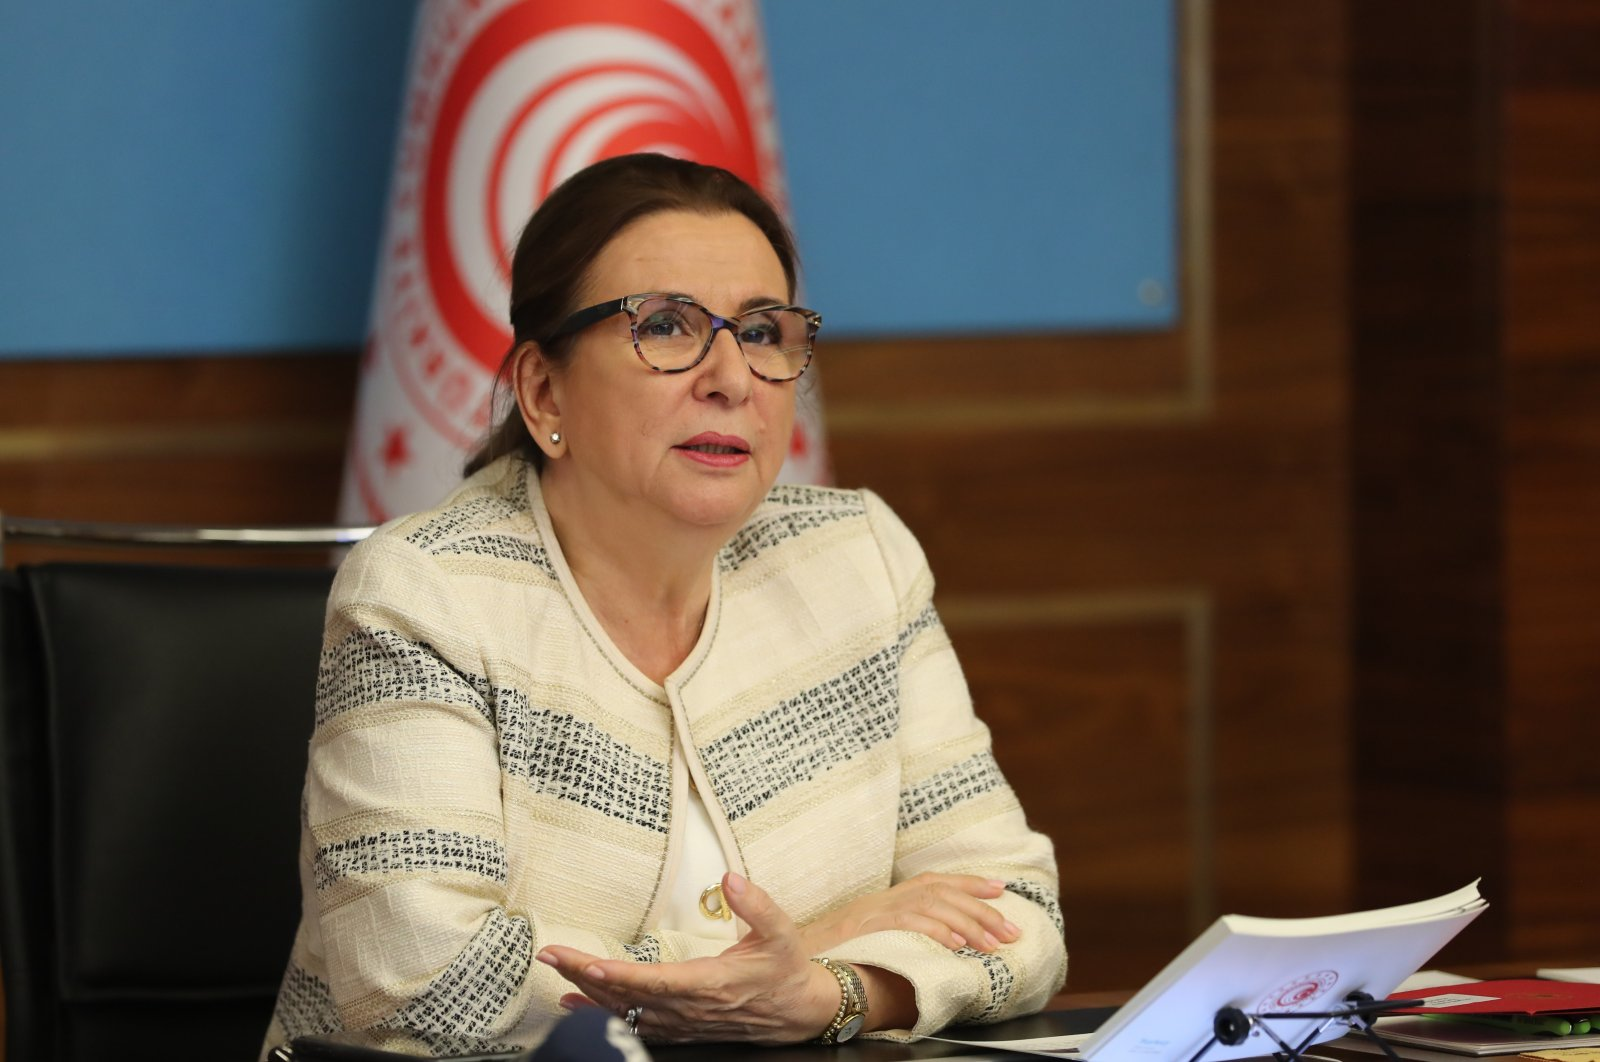 Trade Minister Ruhsar Pekcan speaks during an advisory council meeting, Ankara, June 7, 2020. (İHA Photo)